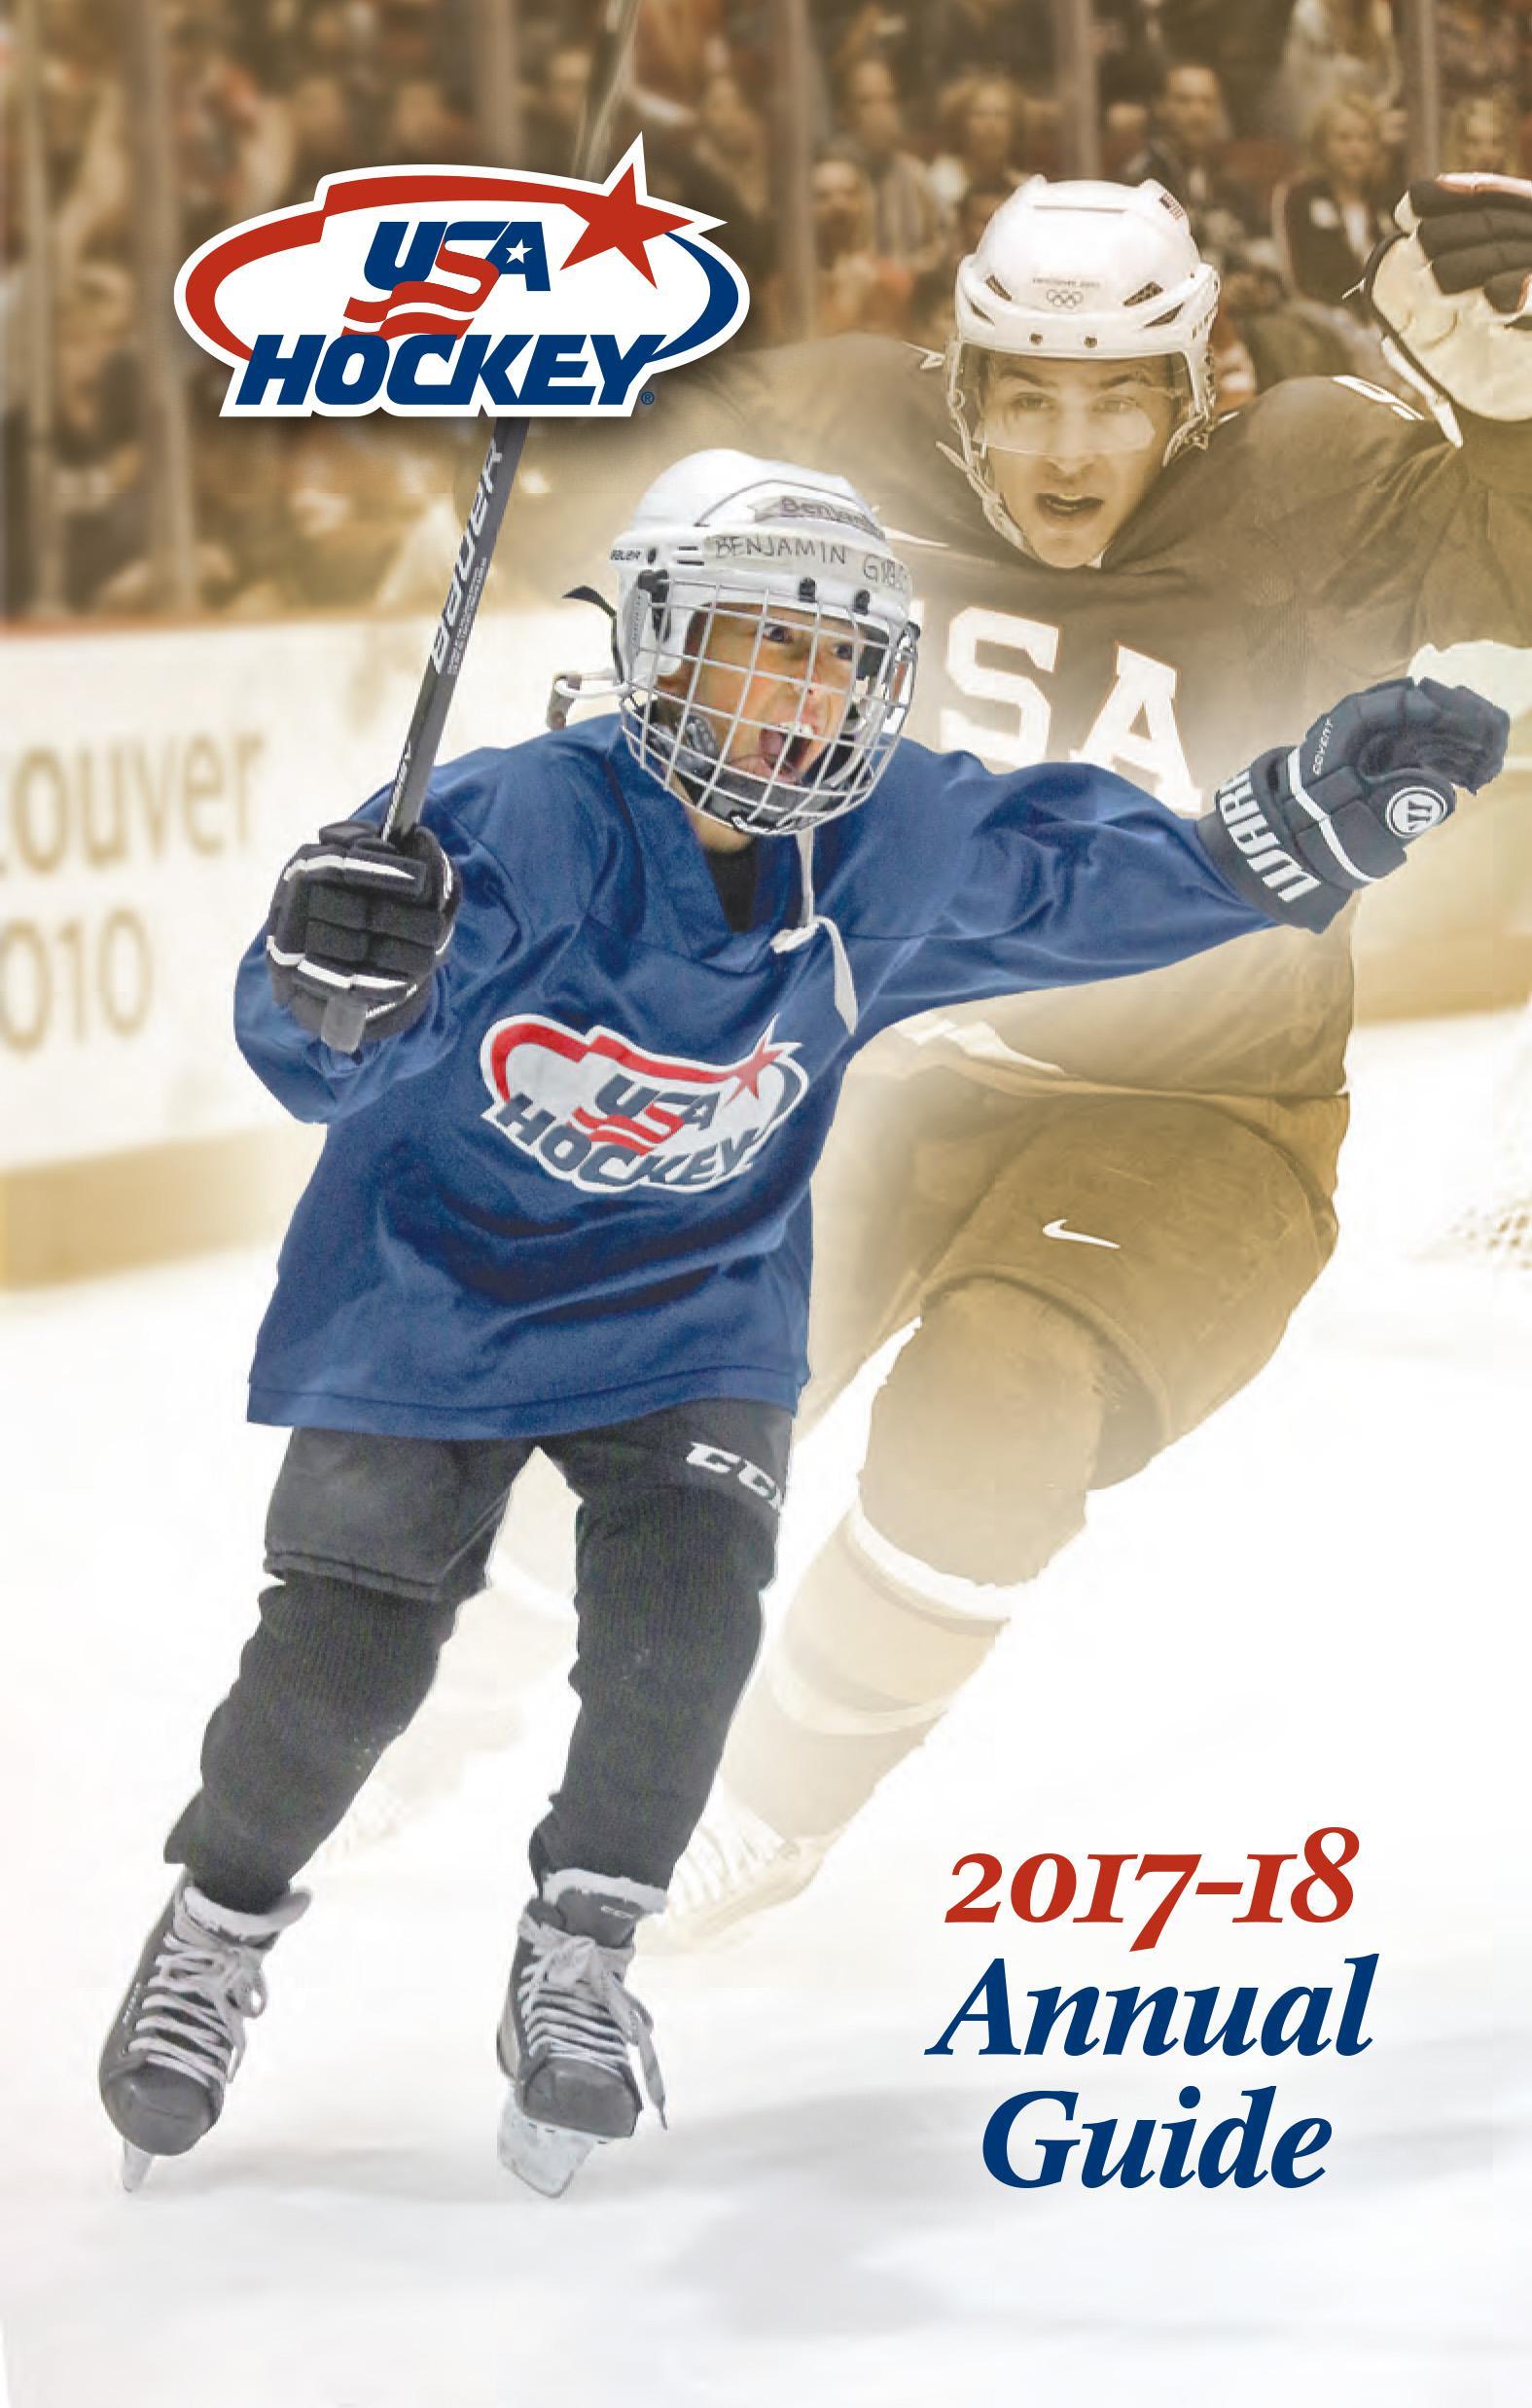 USA Hockey Annual Guide